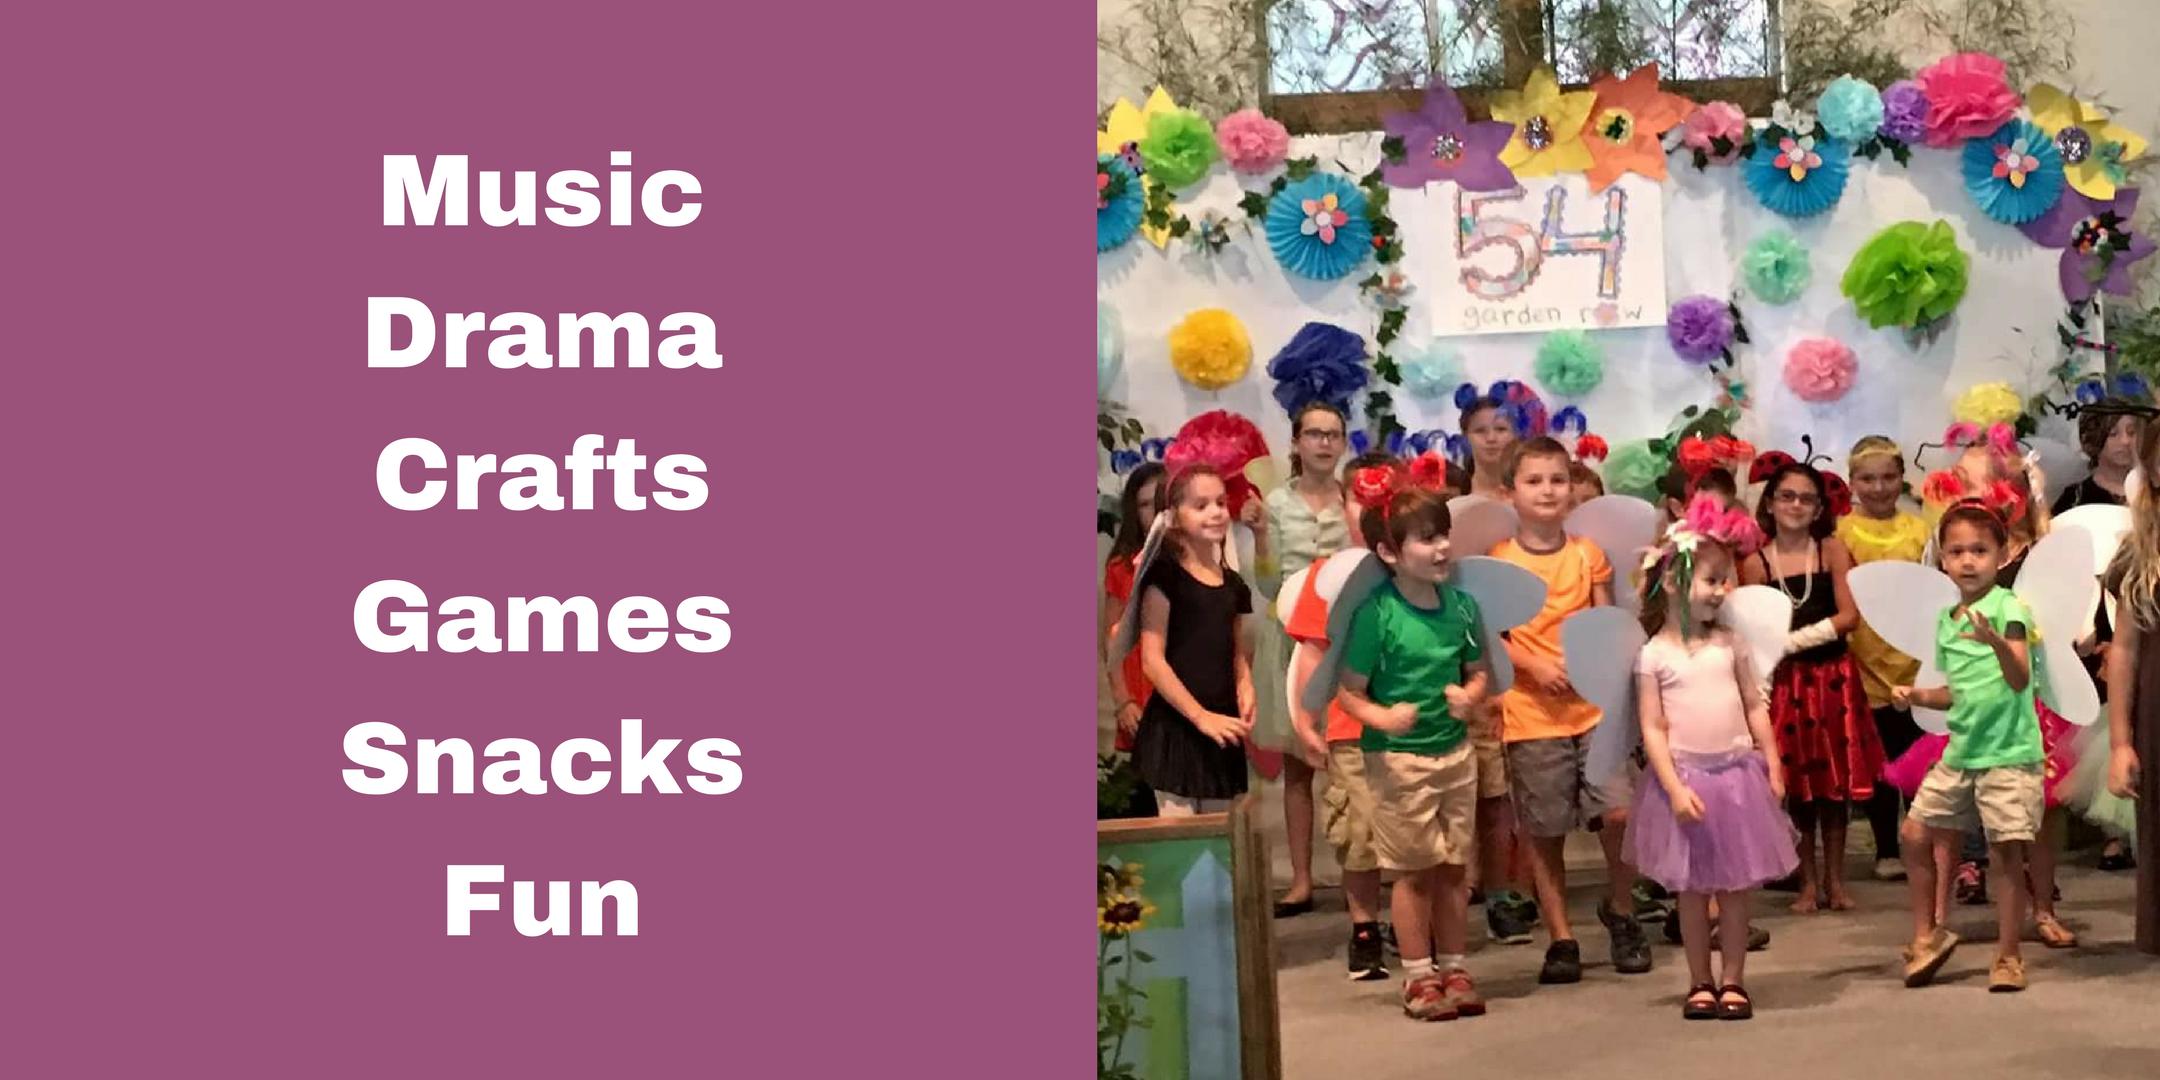 Children's Music and Drama Camp 2017 | Lexington, SC | Faith United Methodist Church | June 19, 2017